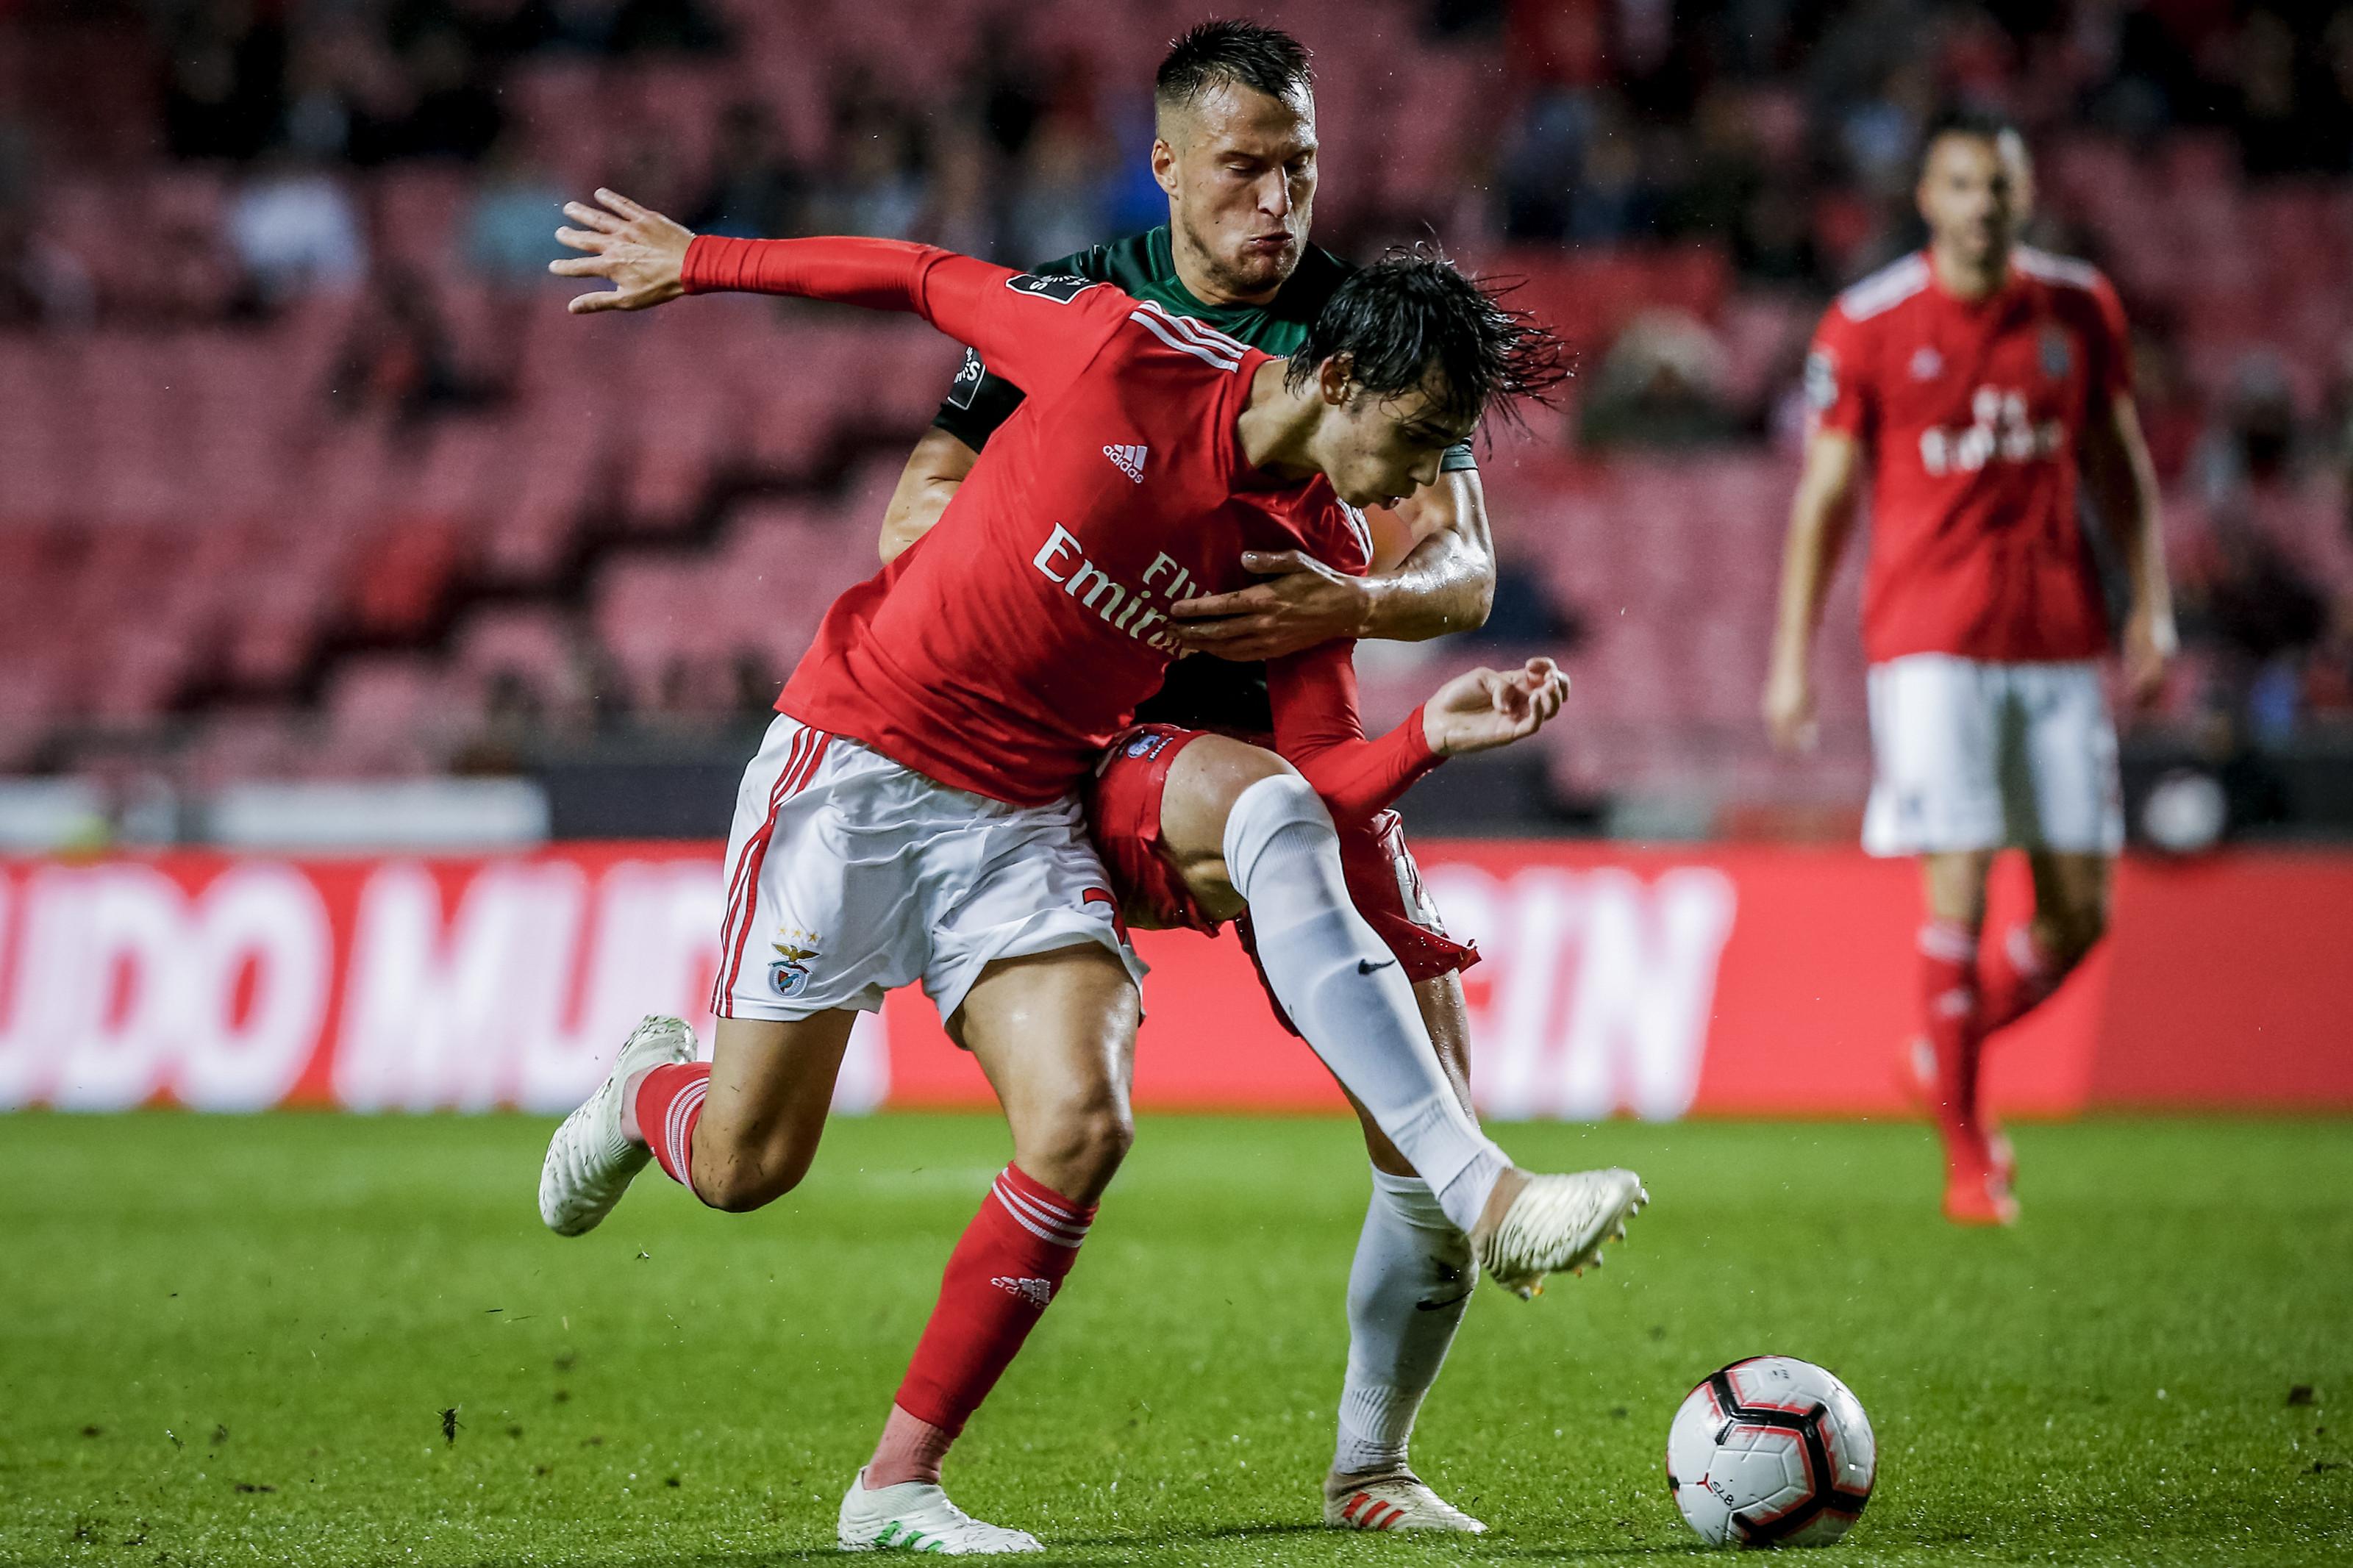 [4-0] Benfica-Marítimo: Cervi marca e cheira a goleada na Luz